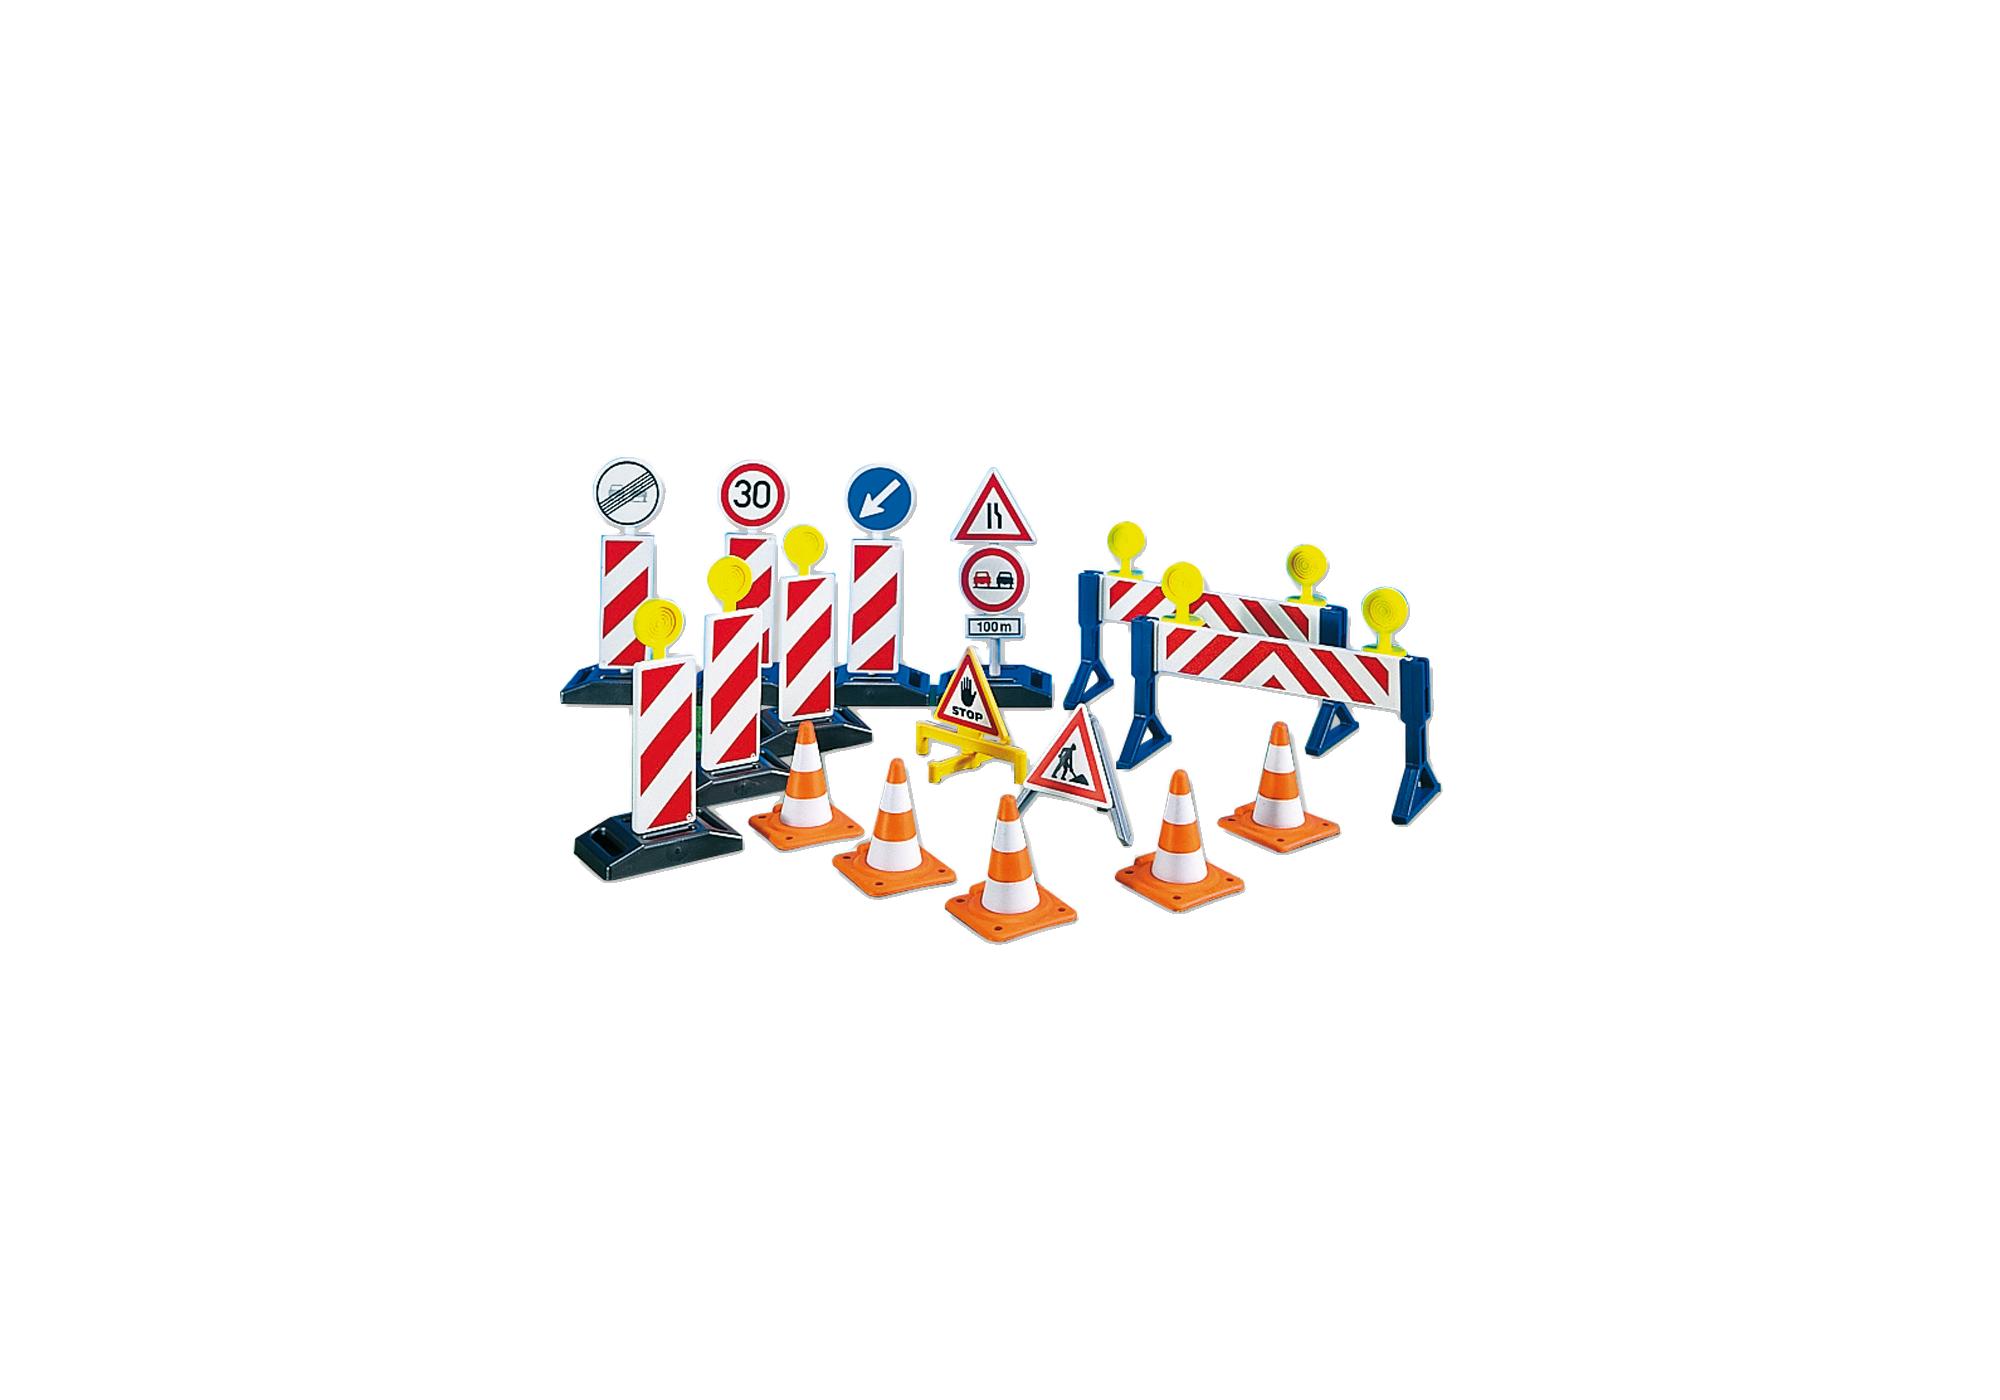 http://media.playmobil.com/i/playmobil/7280_product_detail/Baustellenschilder